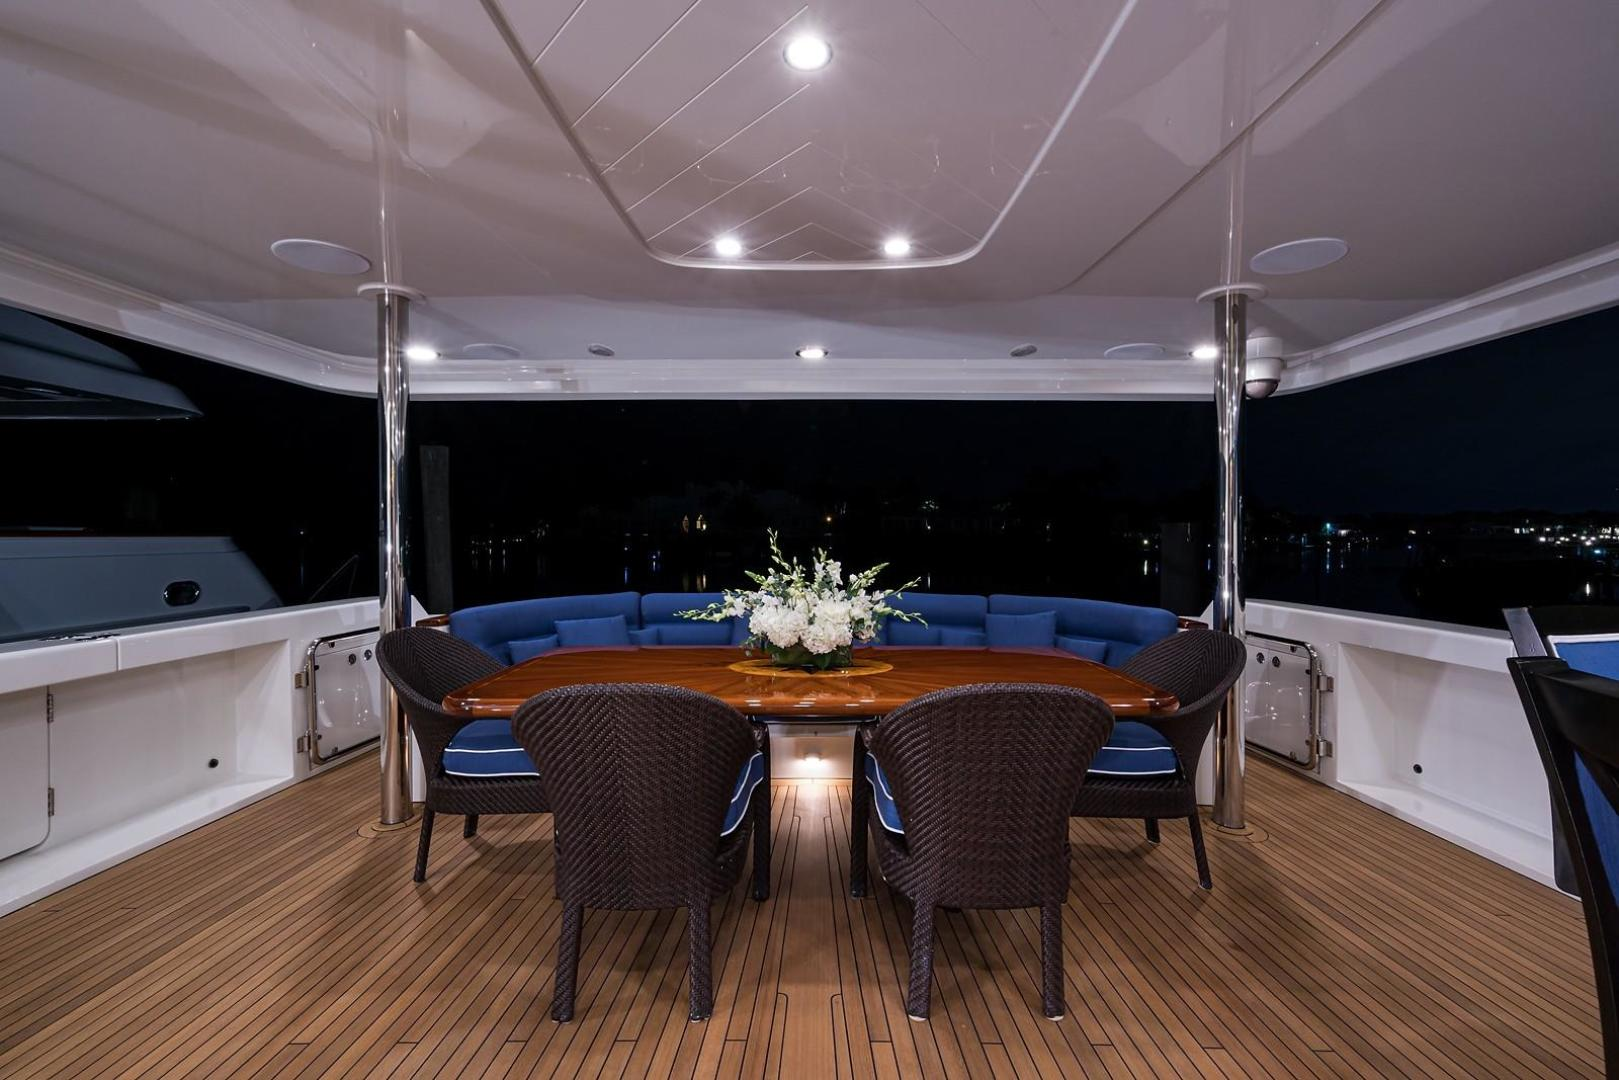 Westport-Motoryacht 2010-Cavallino Fort Lauderdale-Florida-United States-Aft Deck-1270042 | Thumbnail